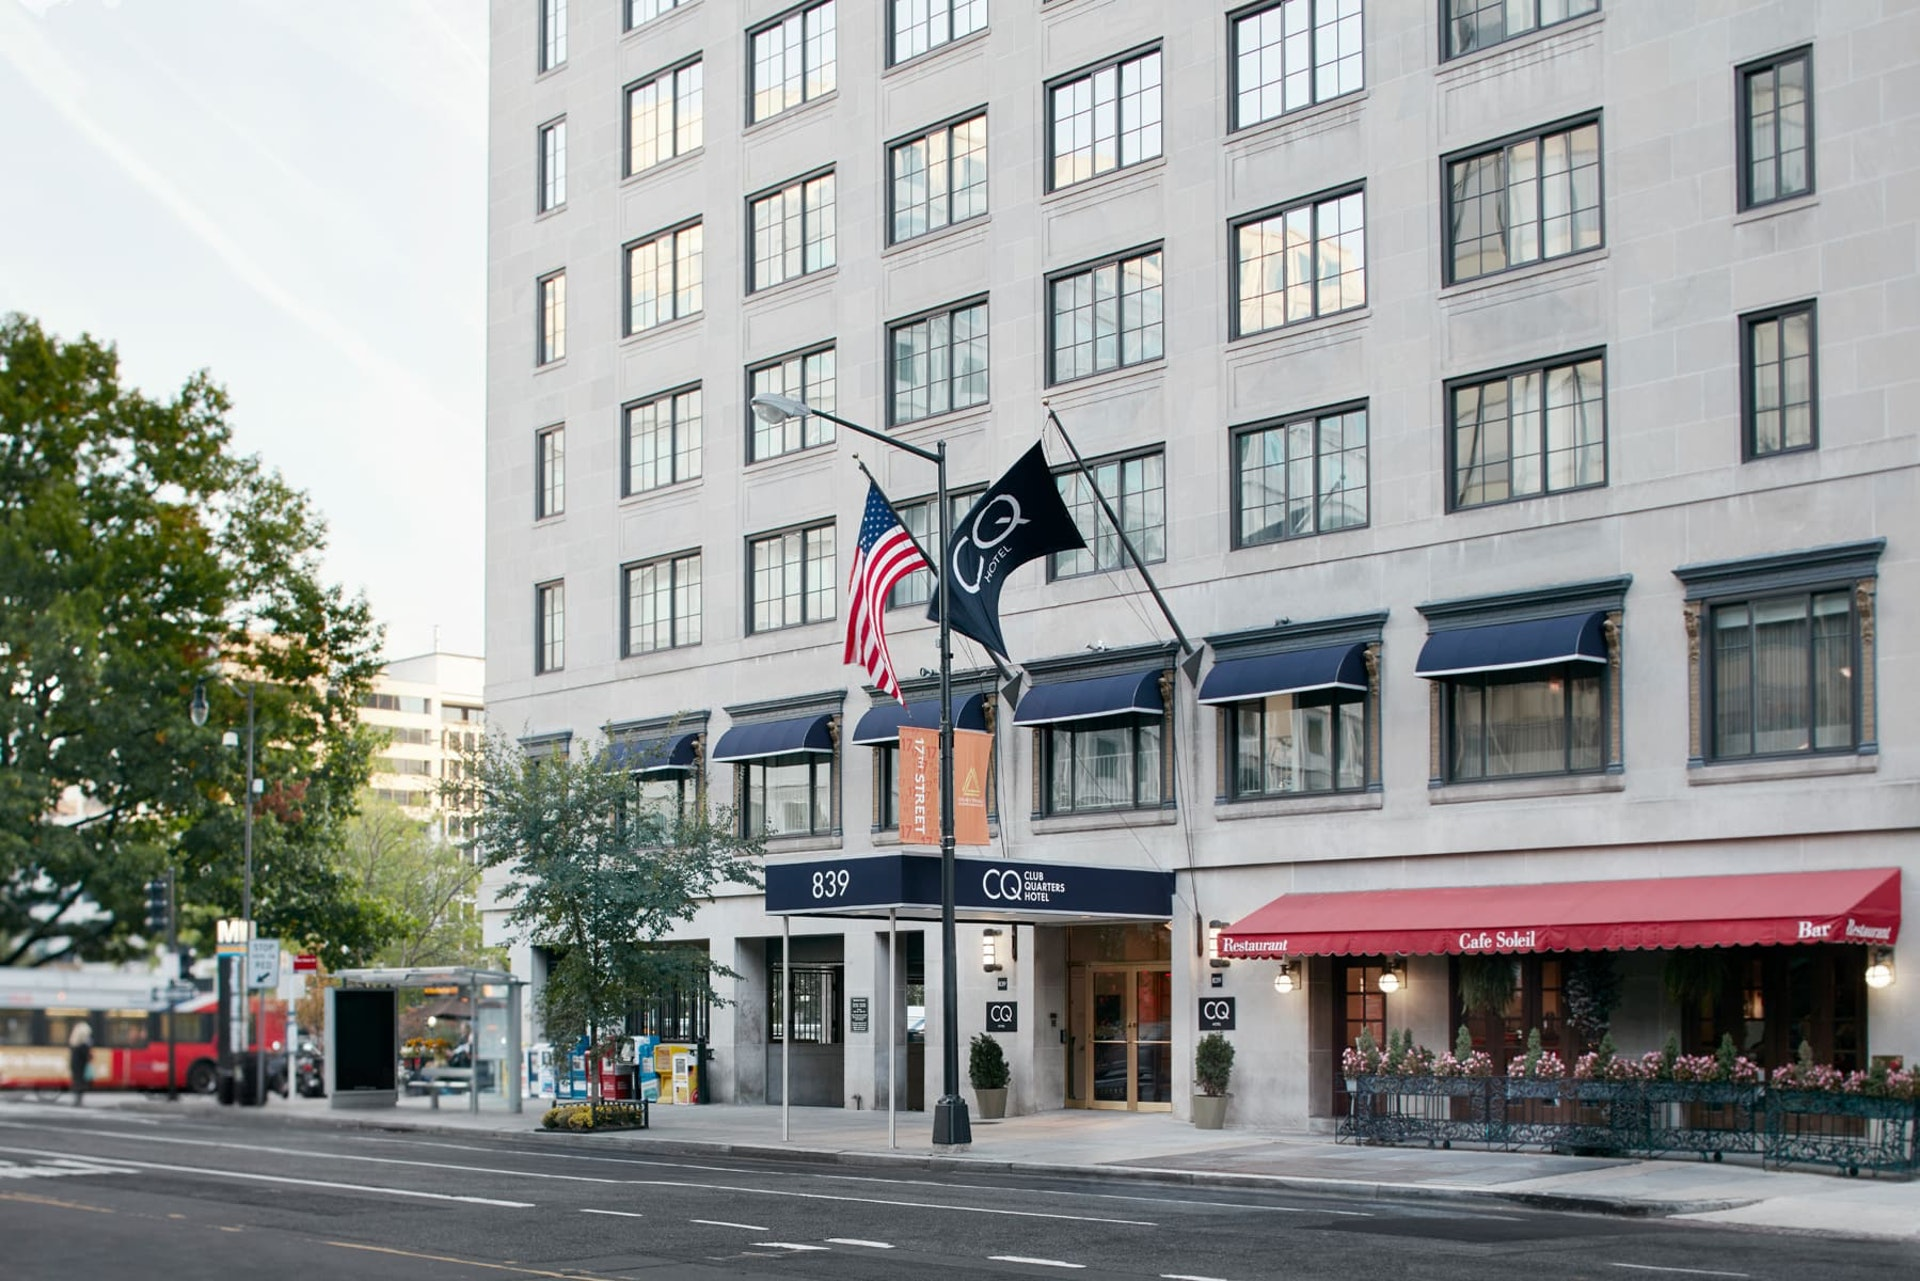 Exterior of CQ Hotel, Washington DC